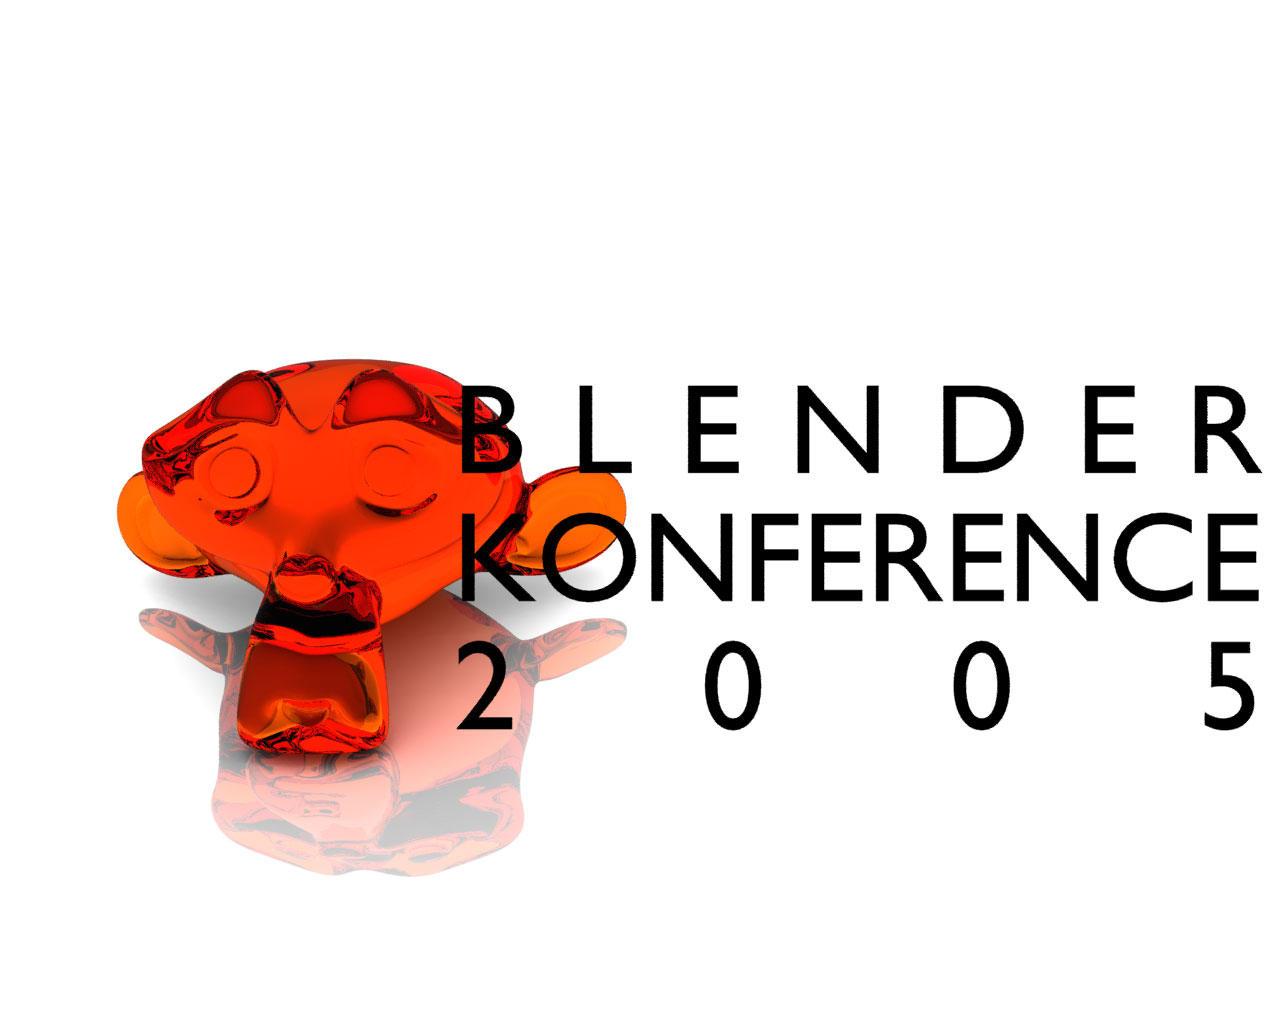 Blender konference 2005 by Pitel